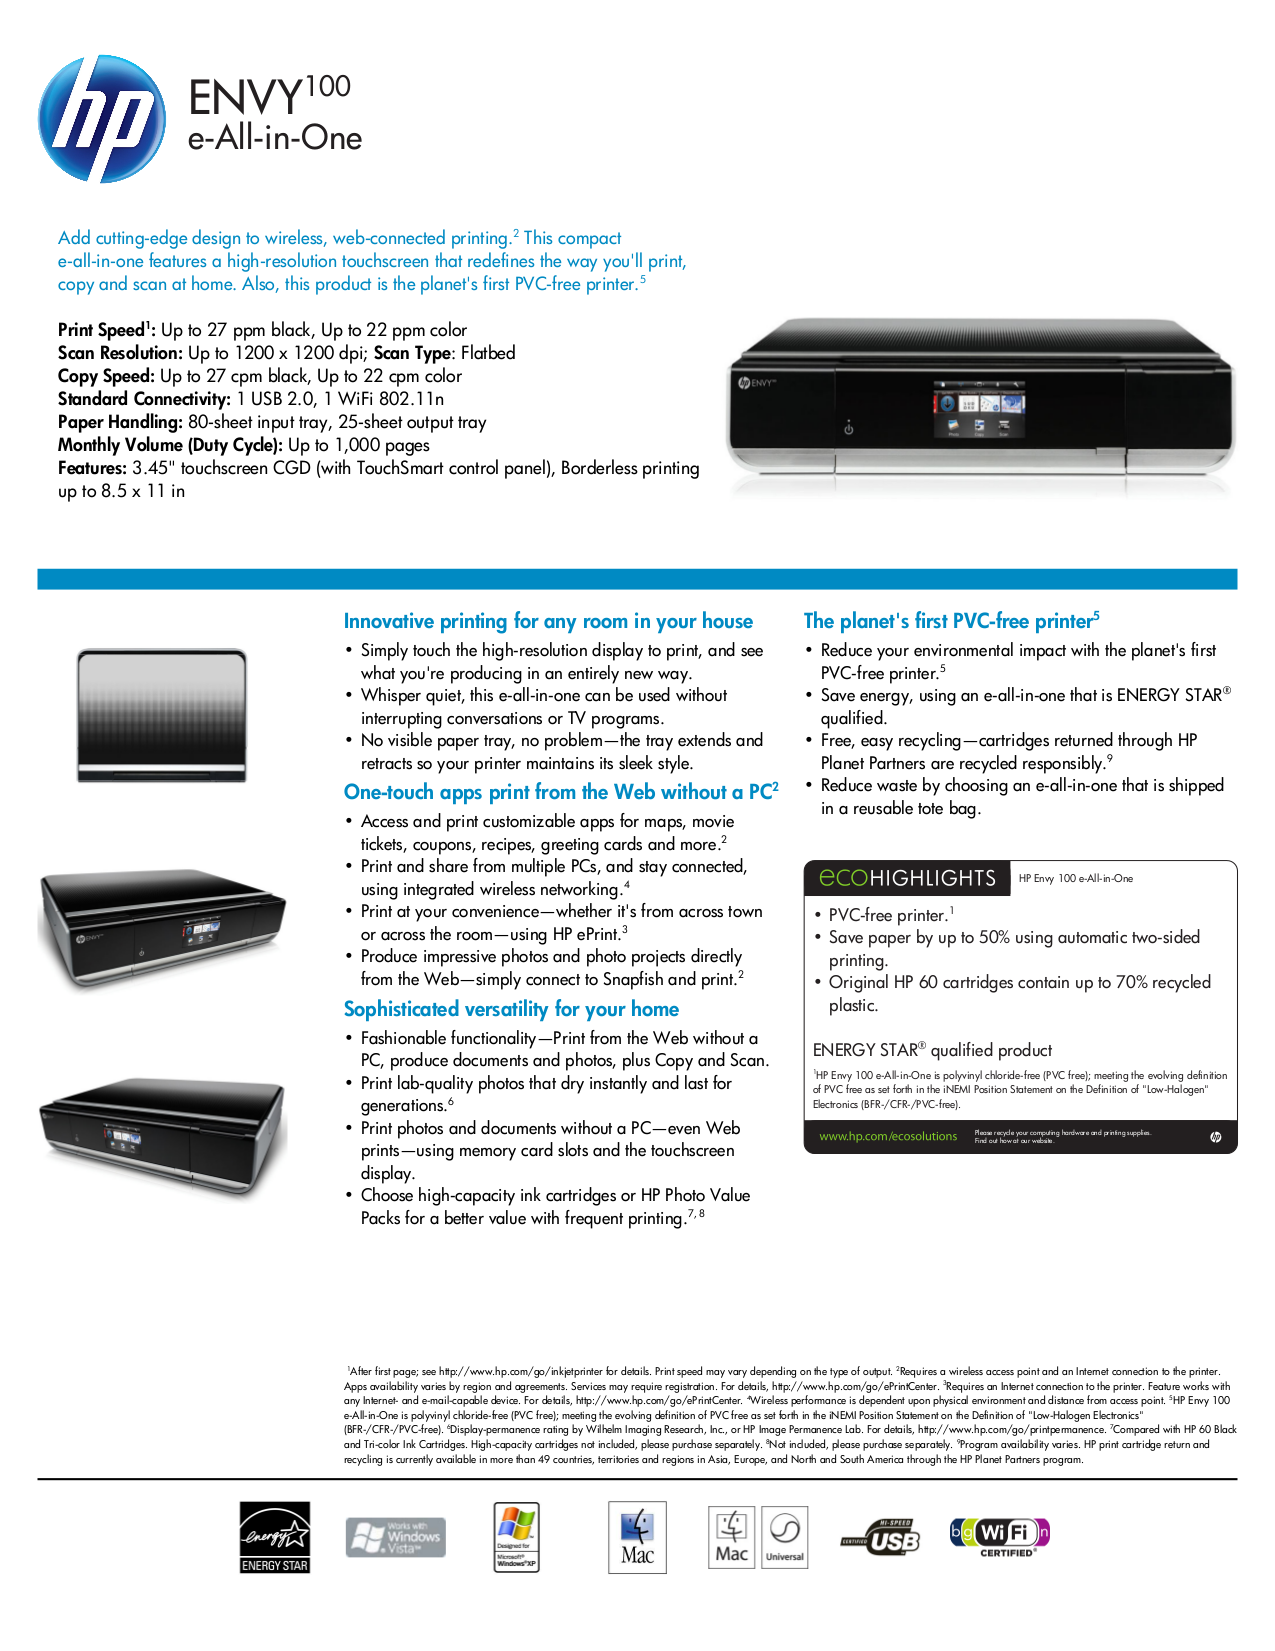 pdf for HP Multifunction Printer Envy 100 manual